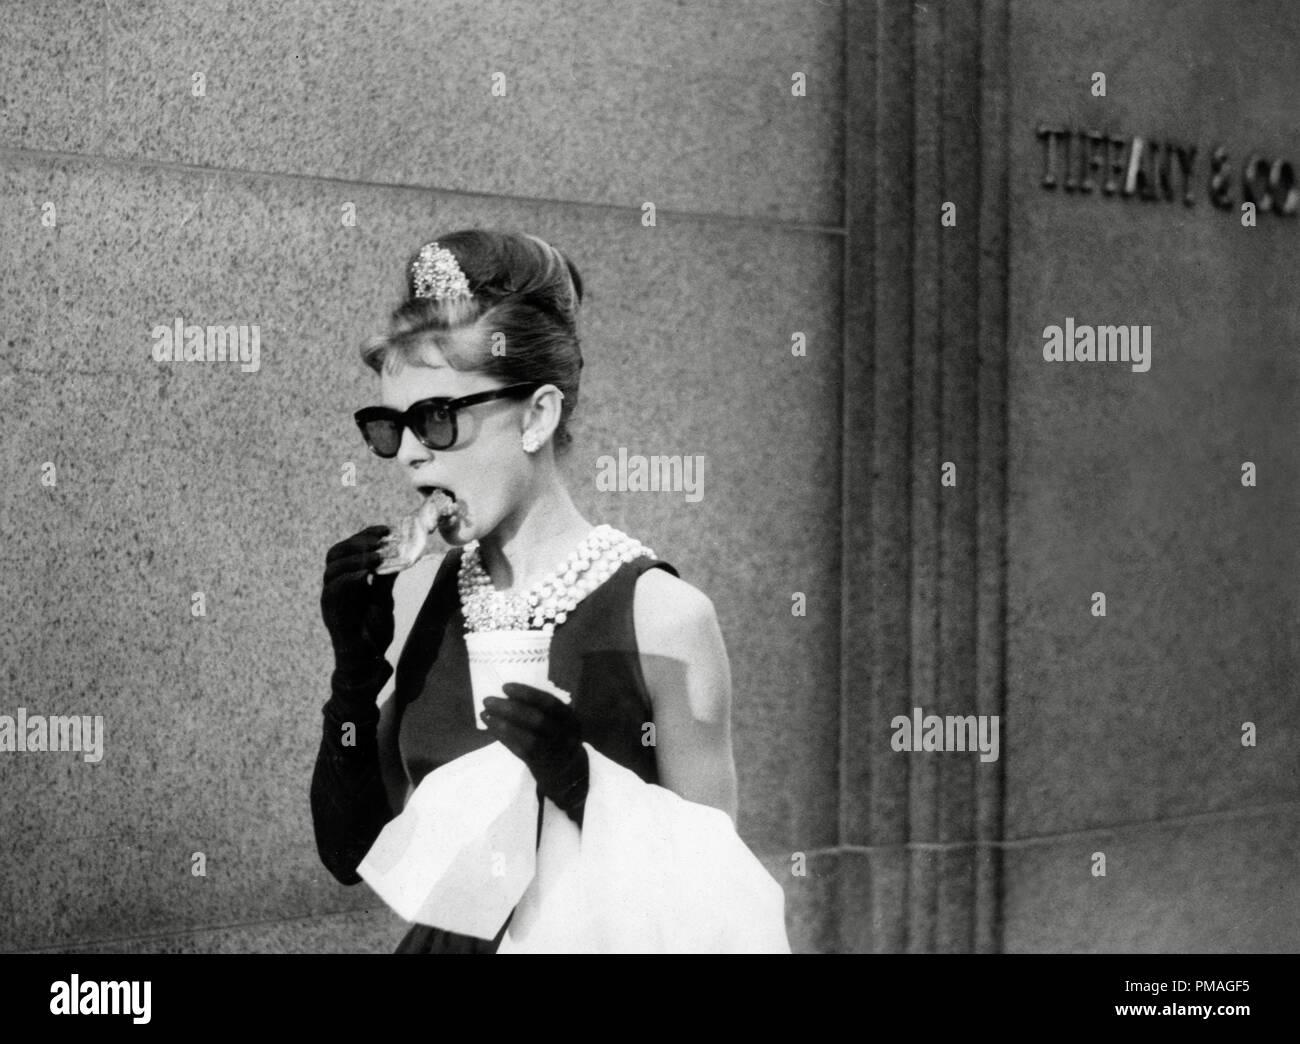 Audrey Hepburn, 'Breakfast at Tiffany's' 1961 ParamountFile Reference # 32733_058THA - Stock Image